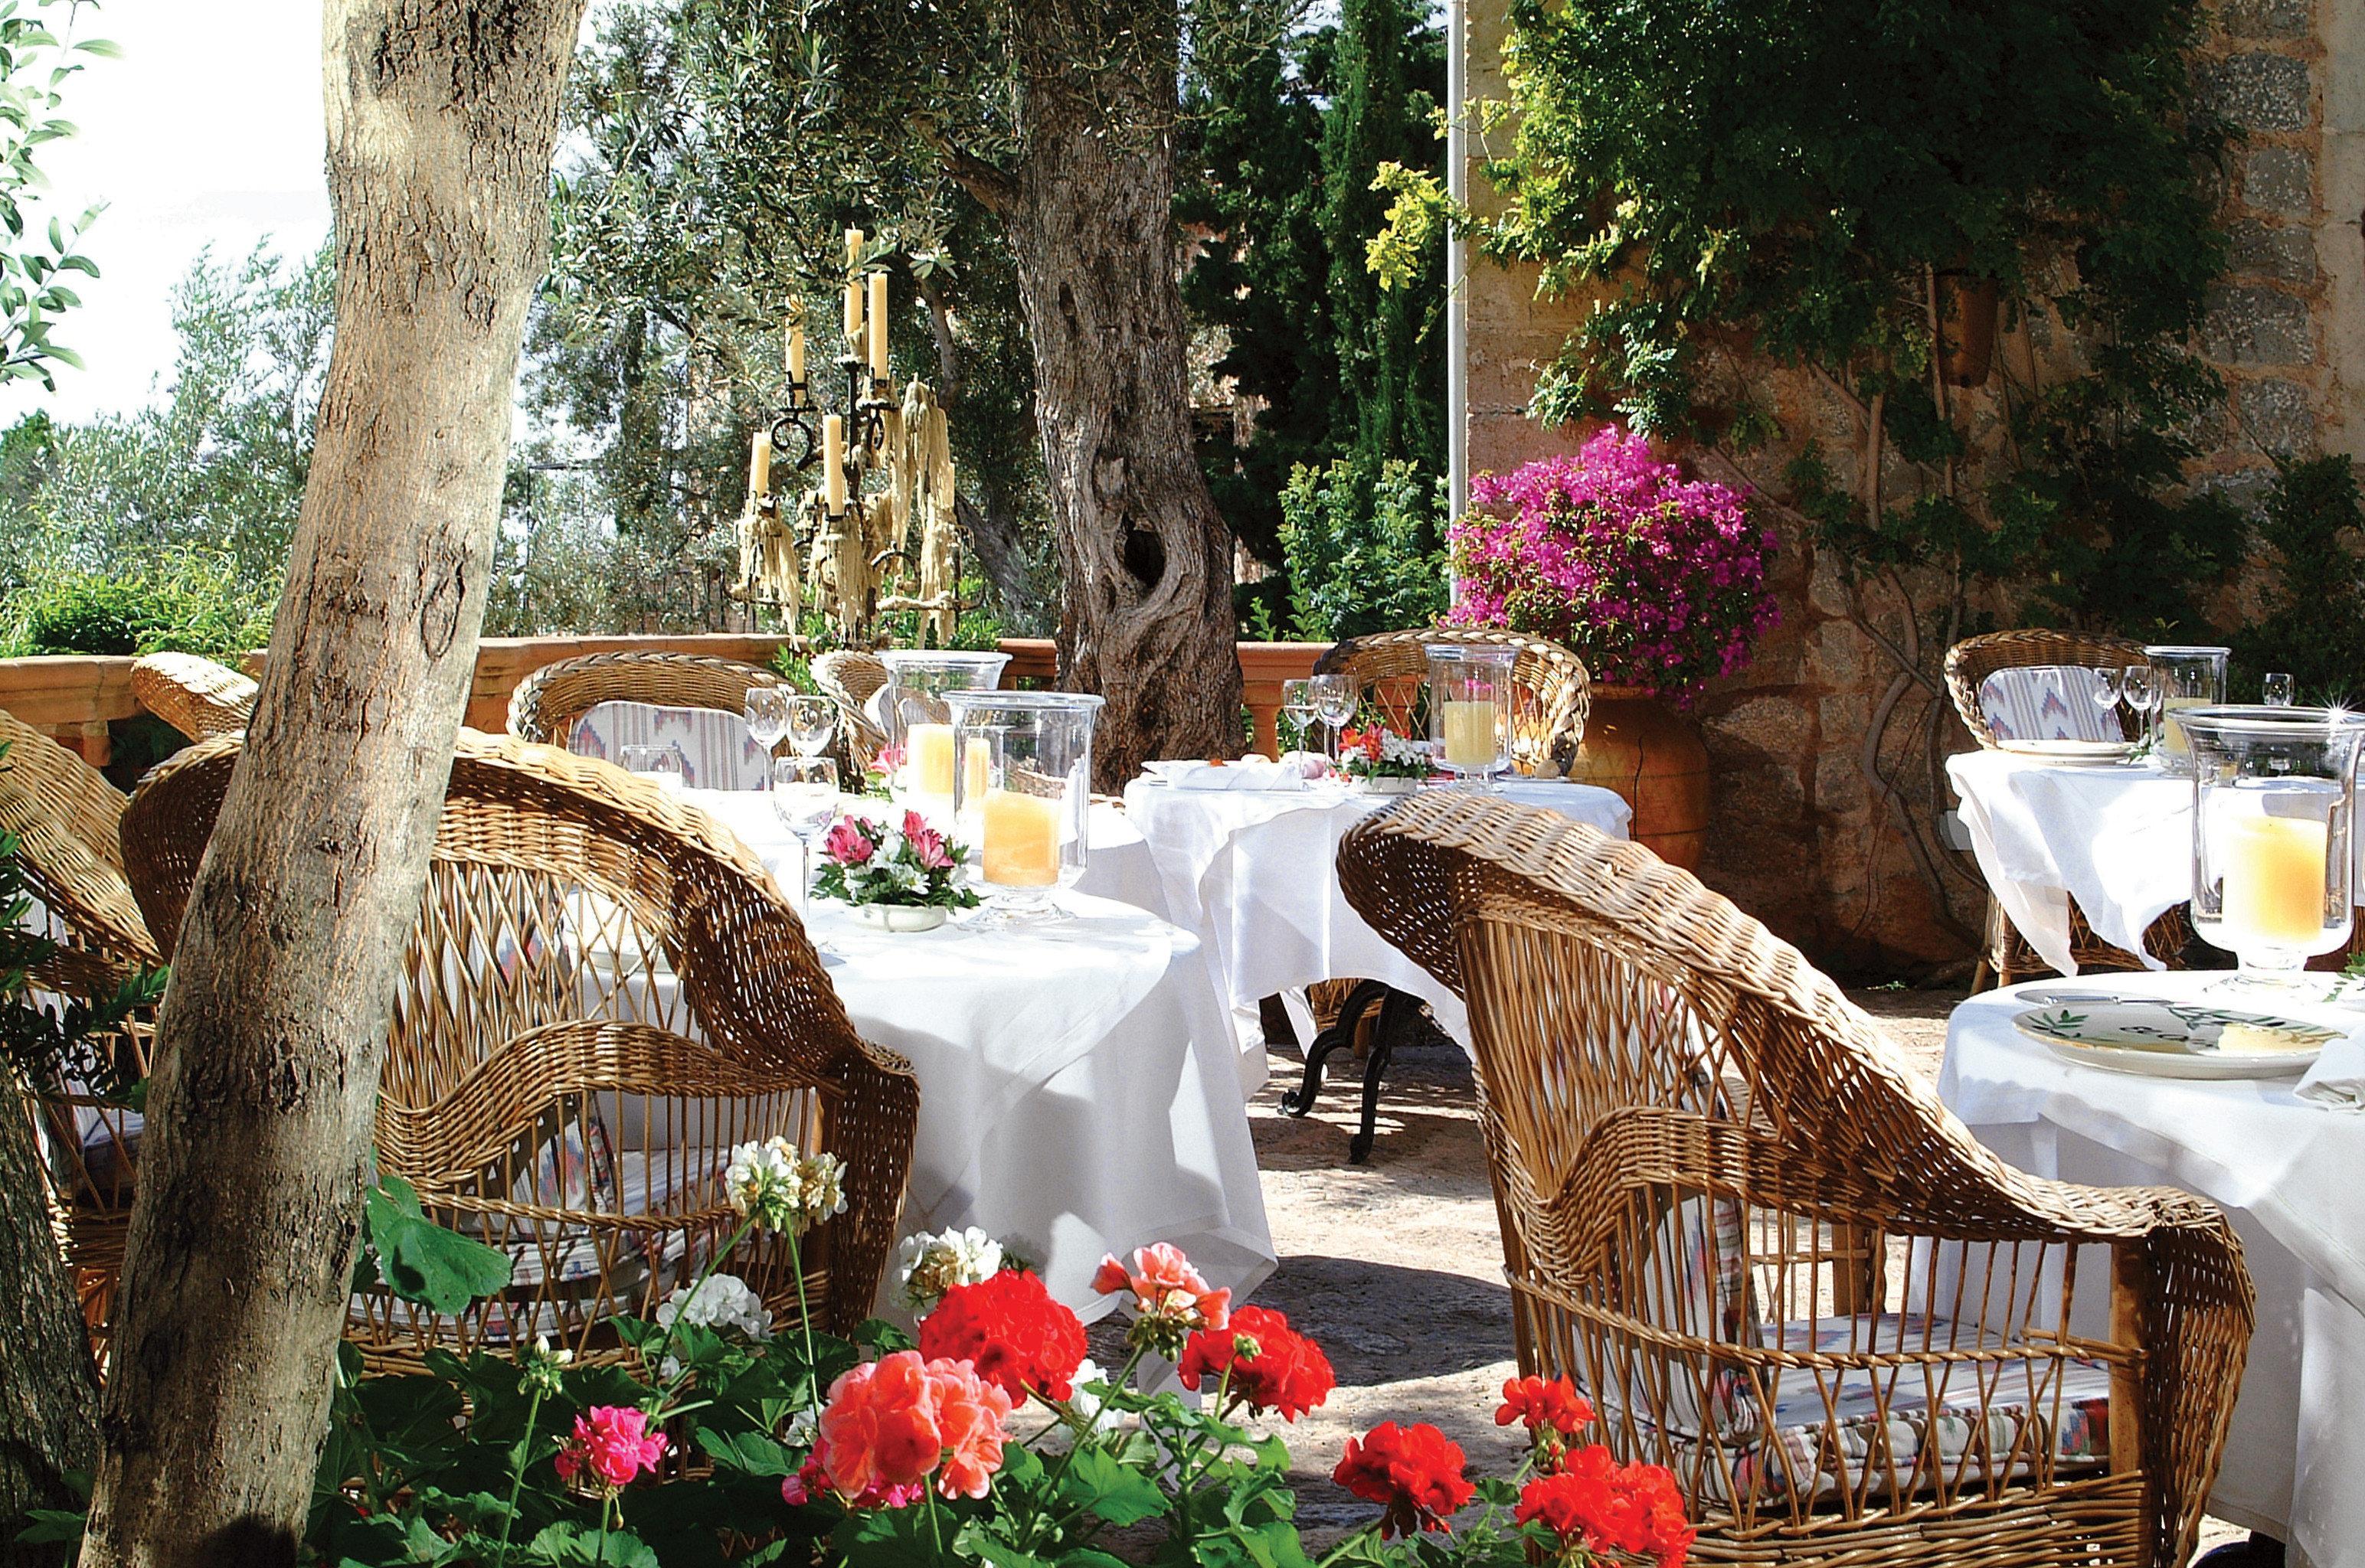 Bar Dining Drink Eat Lounge tree flower wedding ceremony backyard Garden restaurant Resort dining table